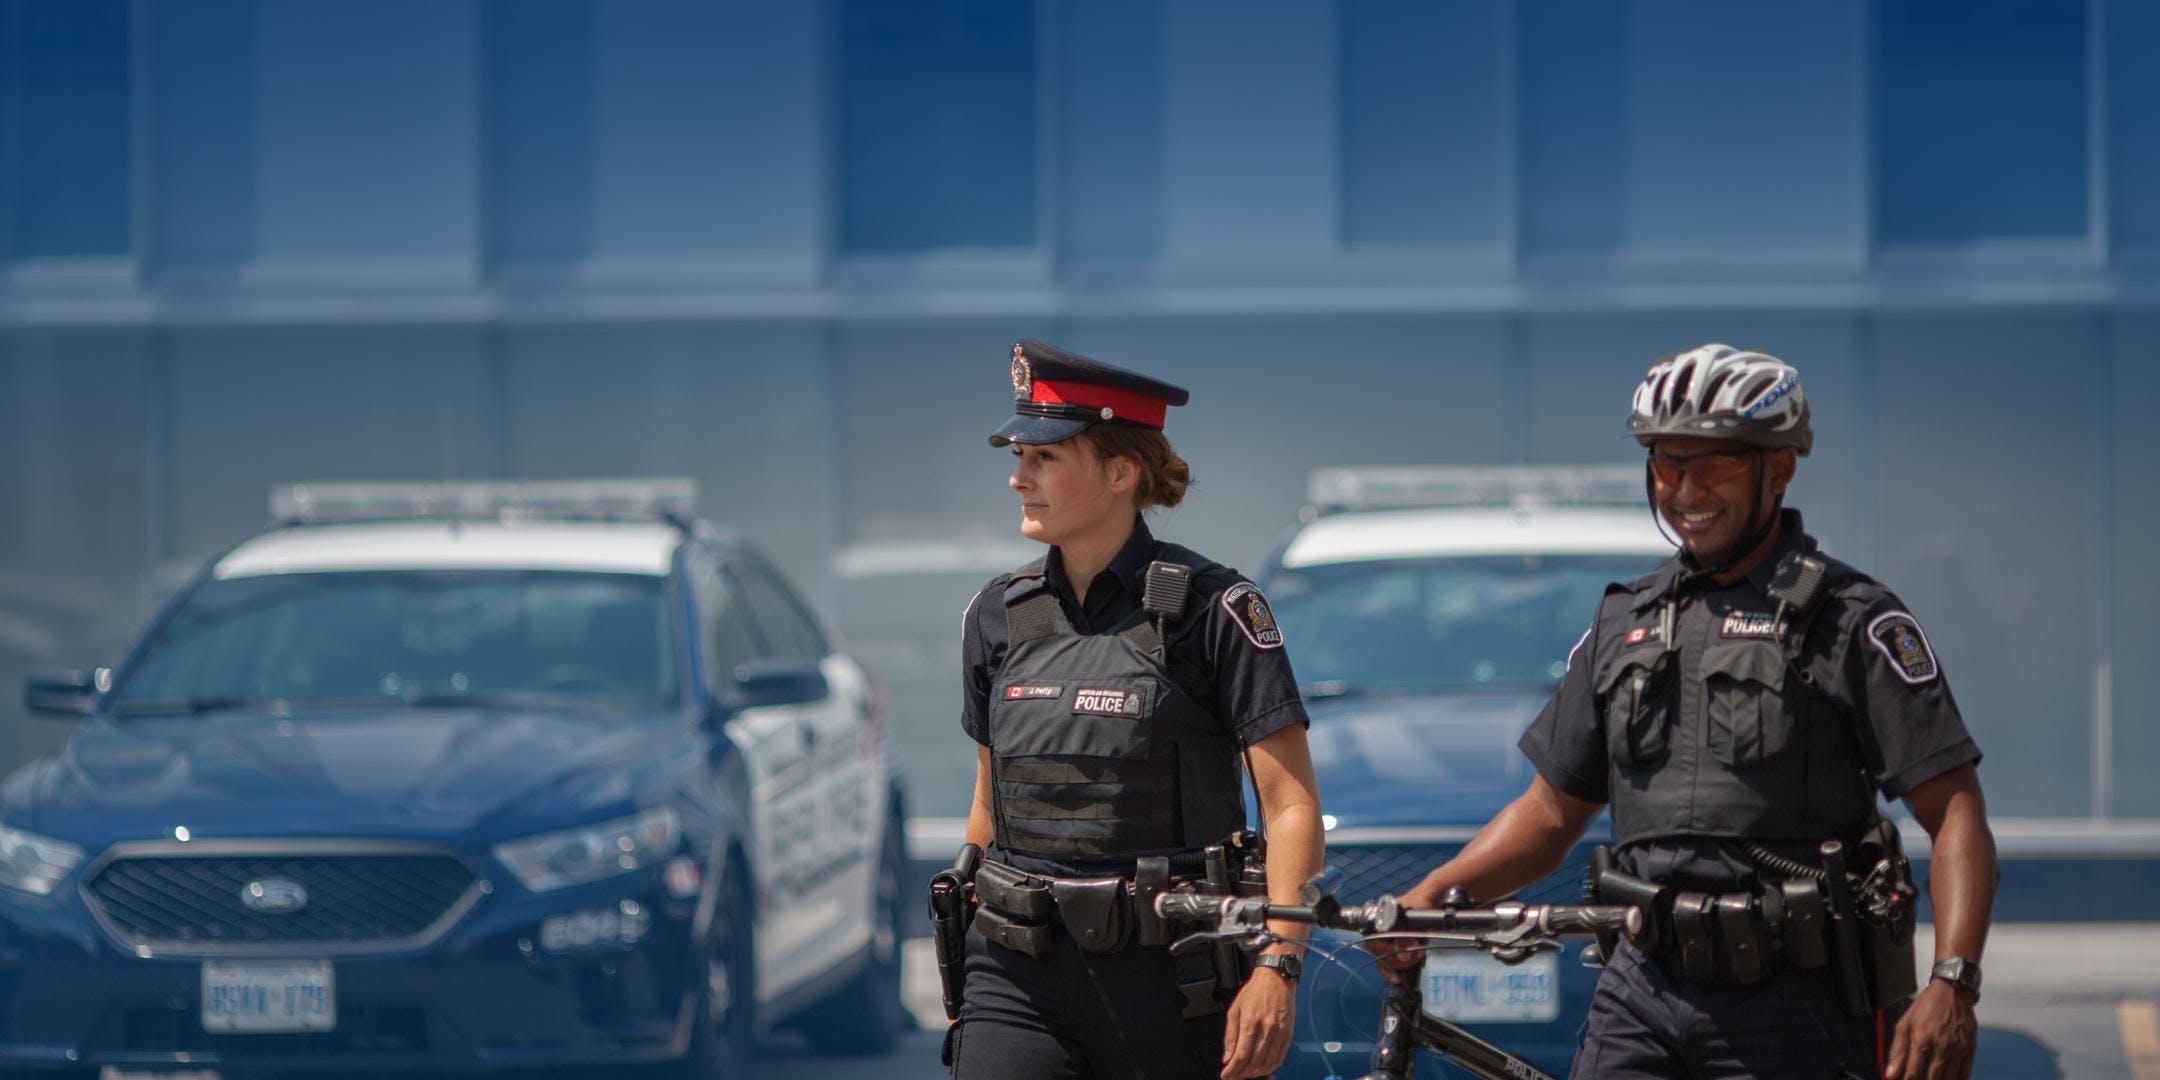 Waterloo Regional Police Service Recruiting I